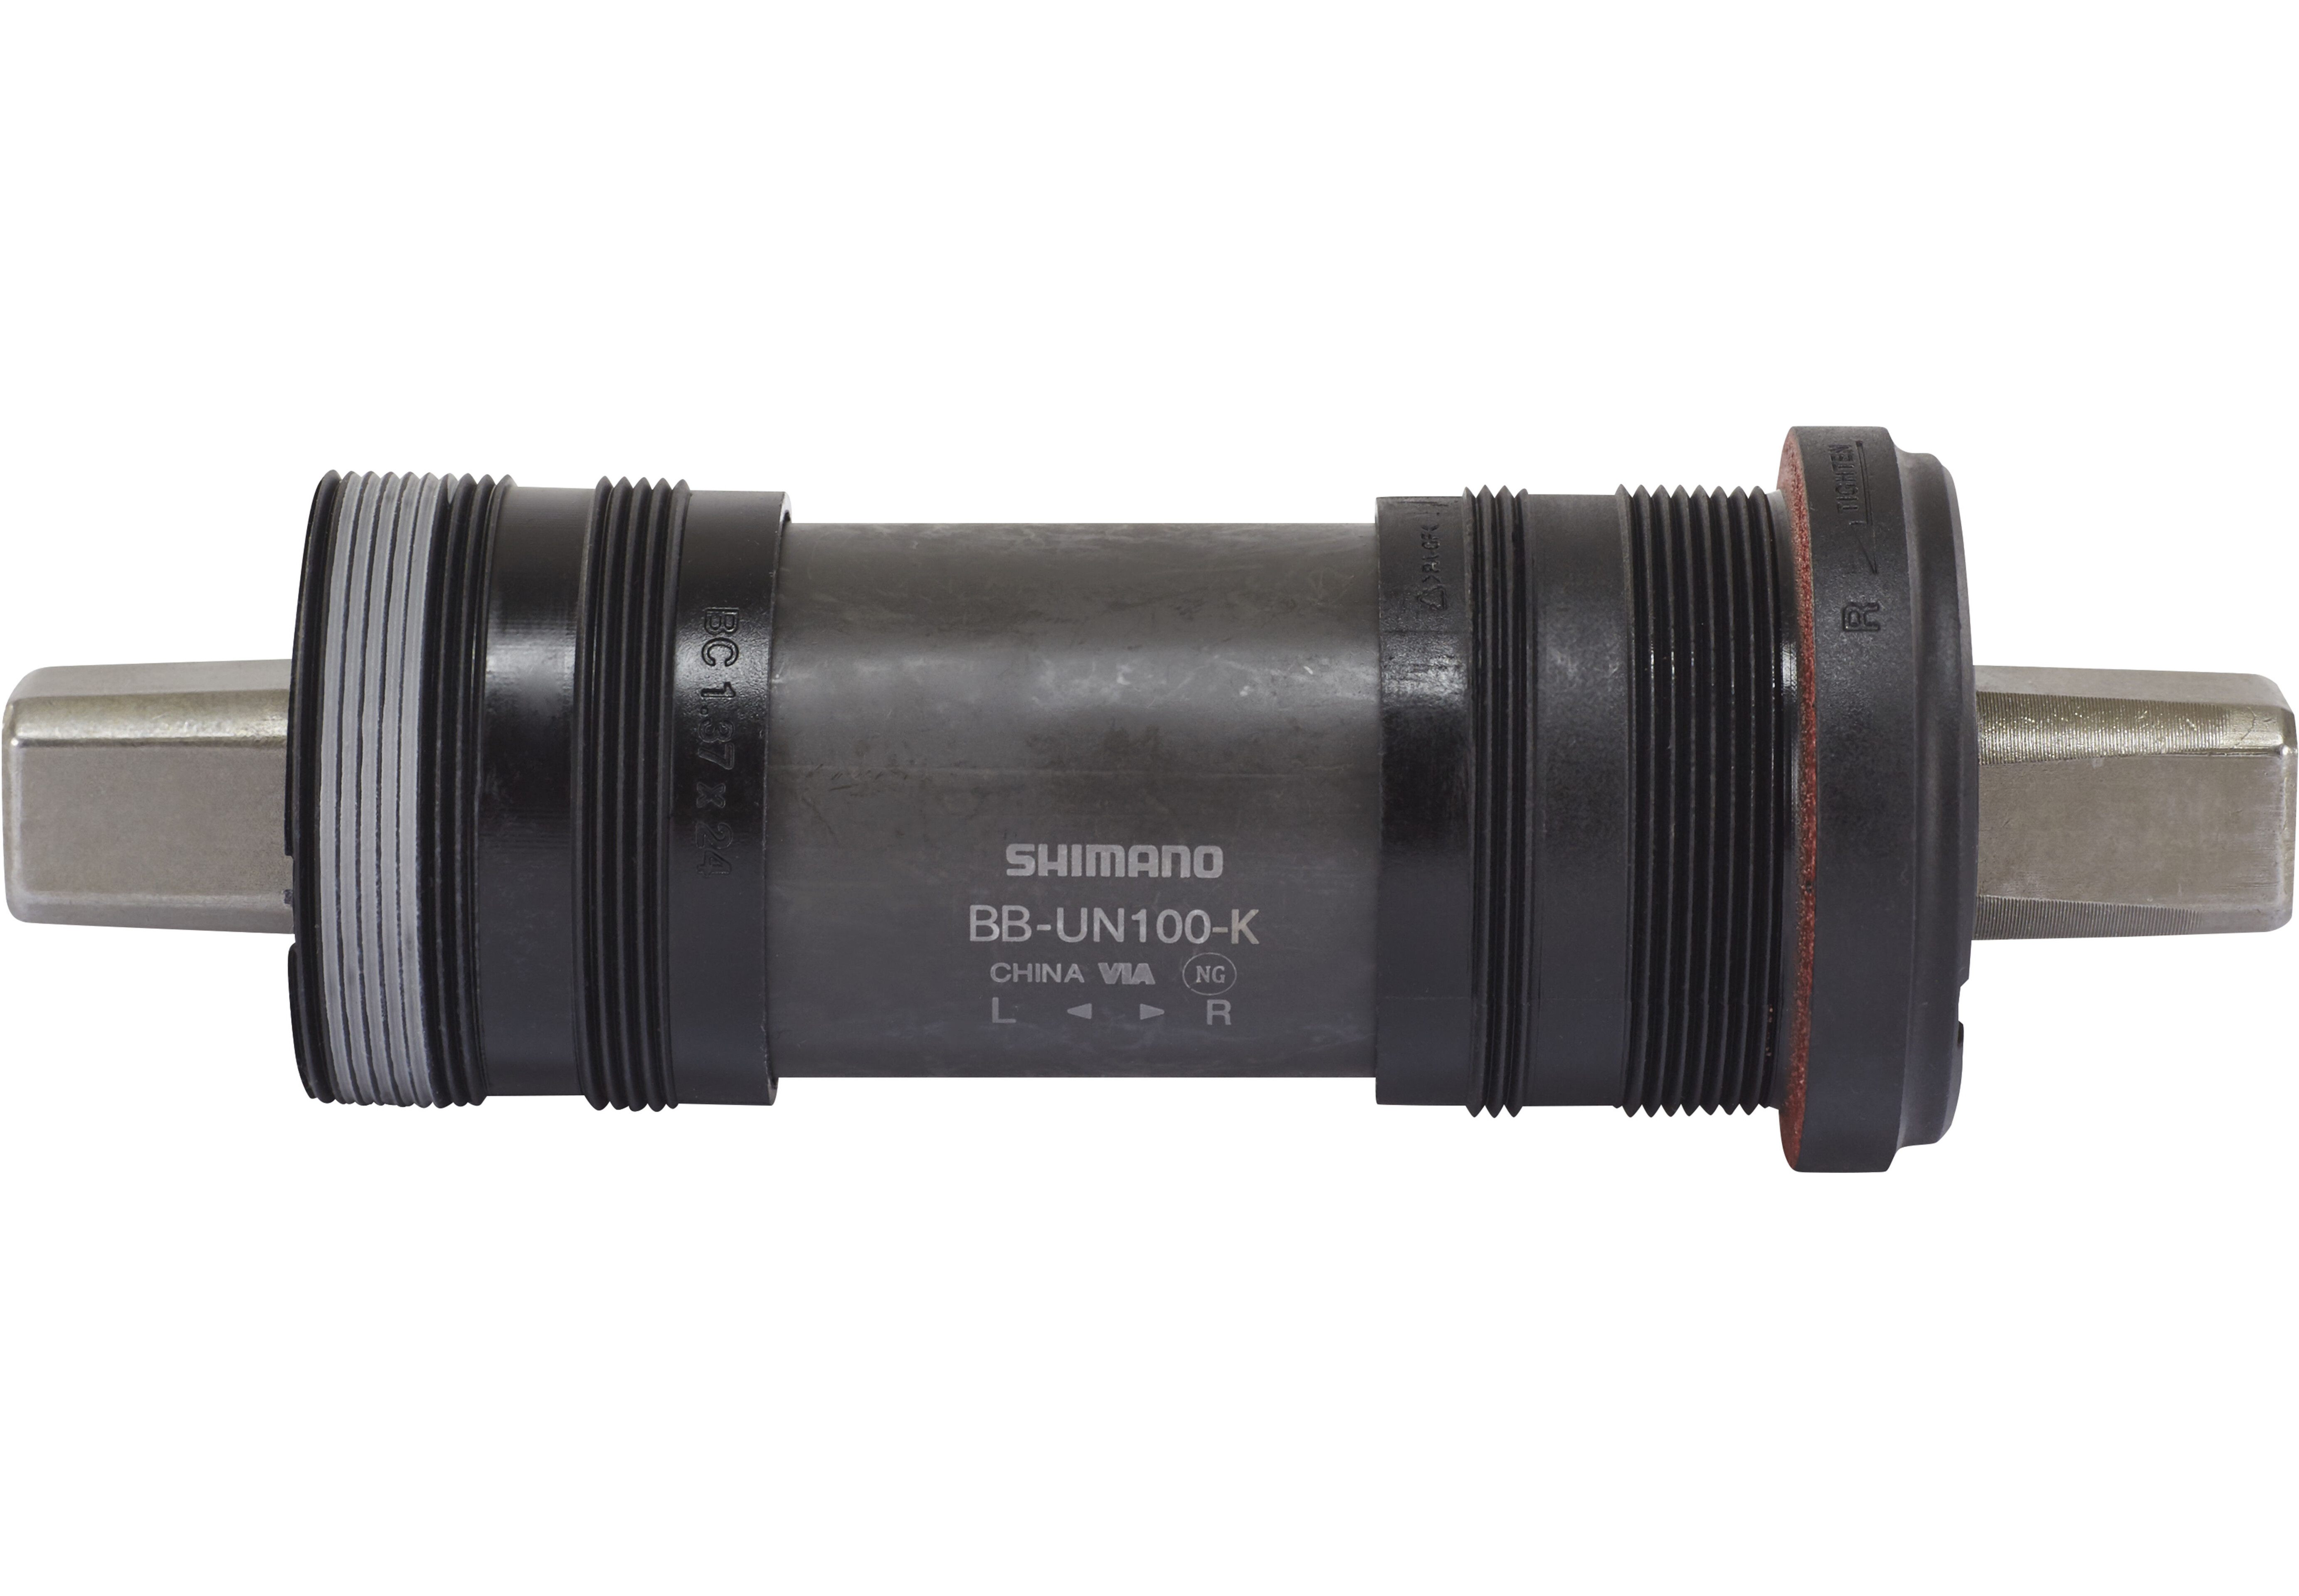 Shimano BB-UN100 Axe de pédalier tige carrée BSA LL123 68 mm pour carter de  chaîne